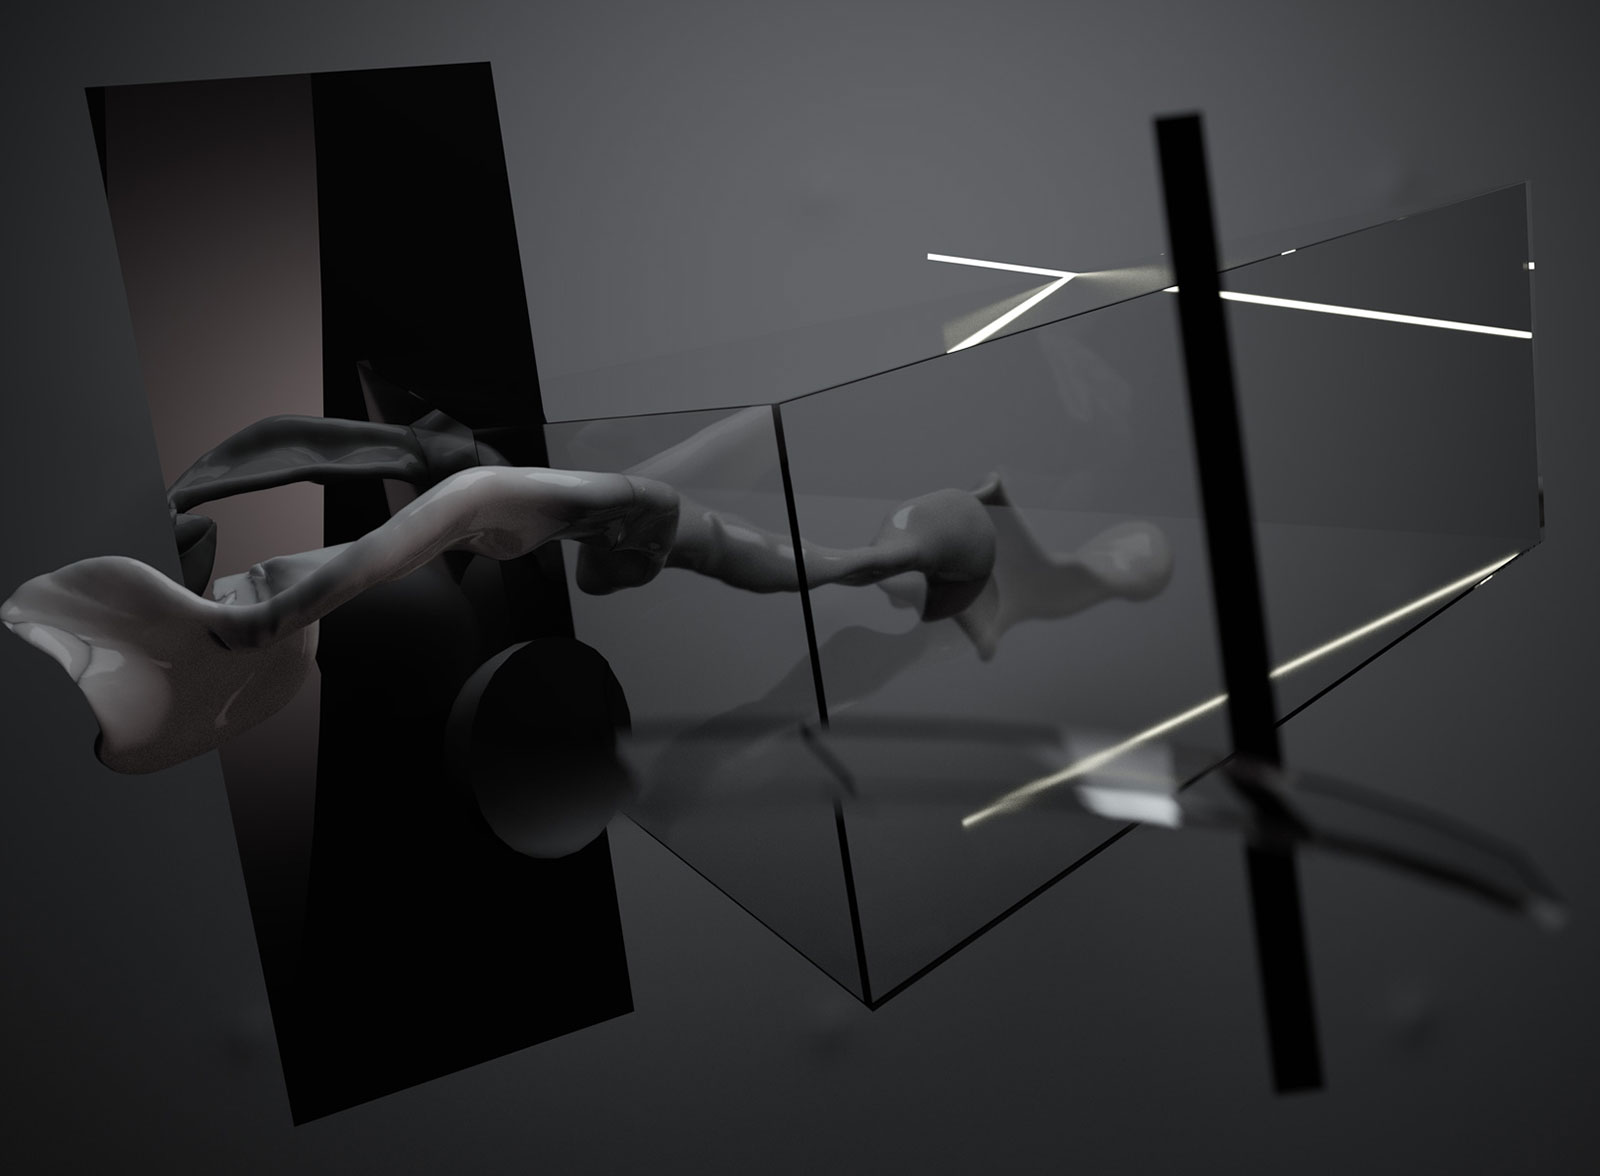 Composition II 01, CGI Fine Art Print, 101 x 135 cm, 2012